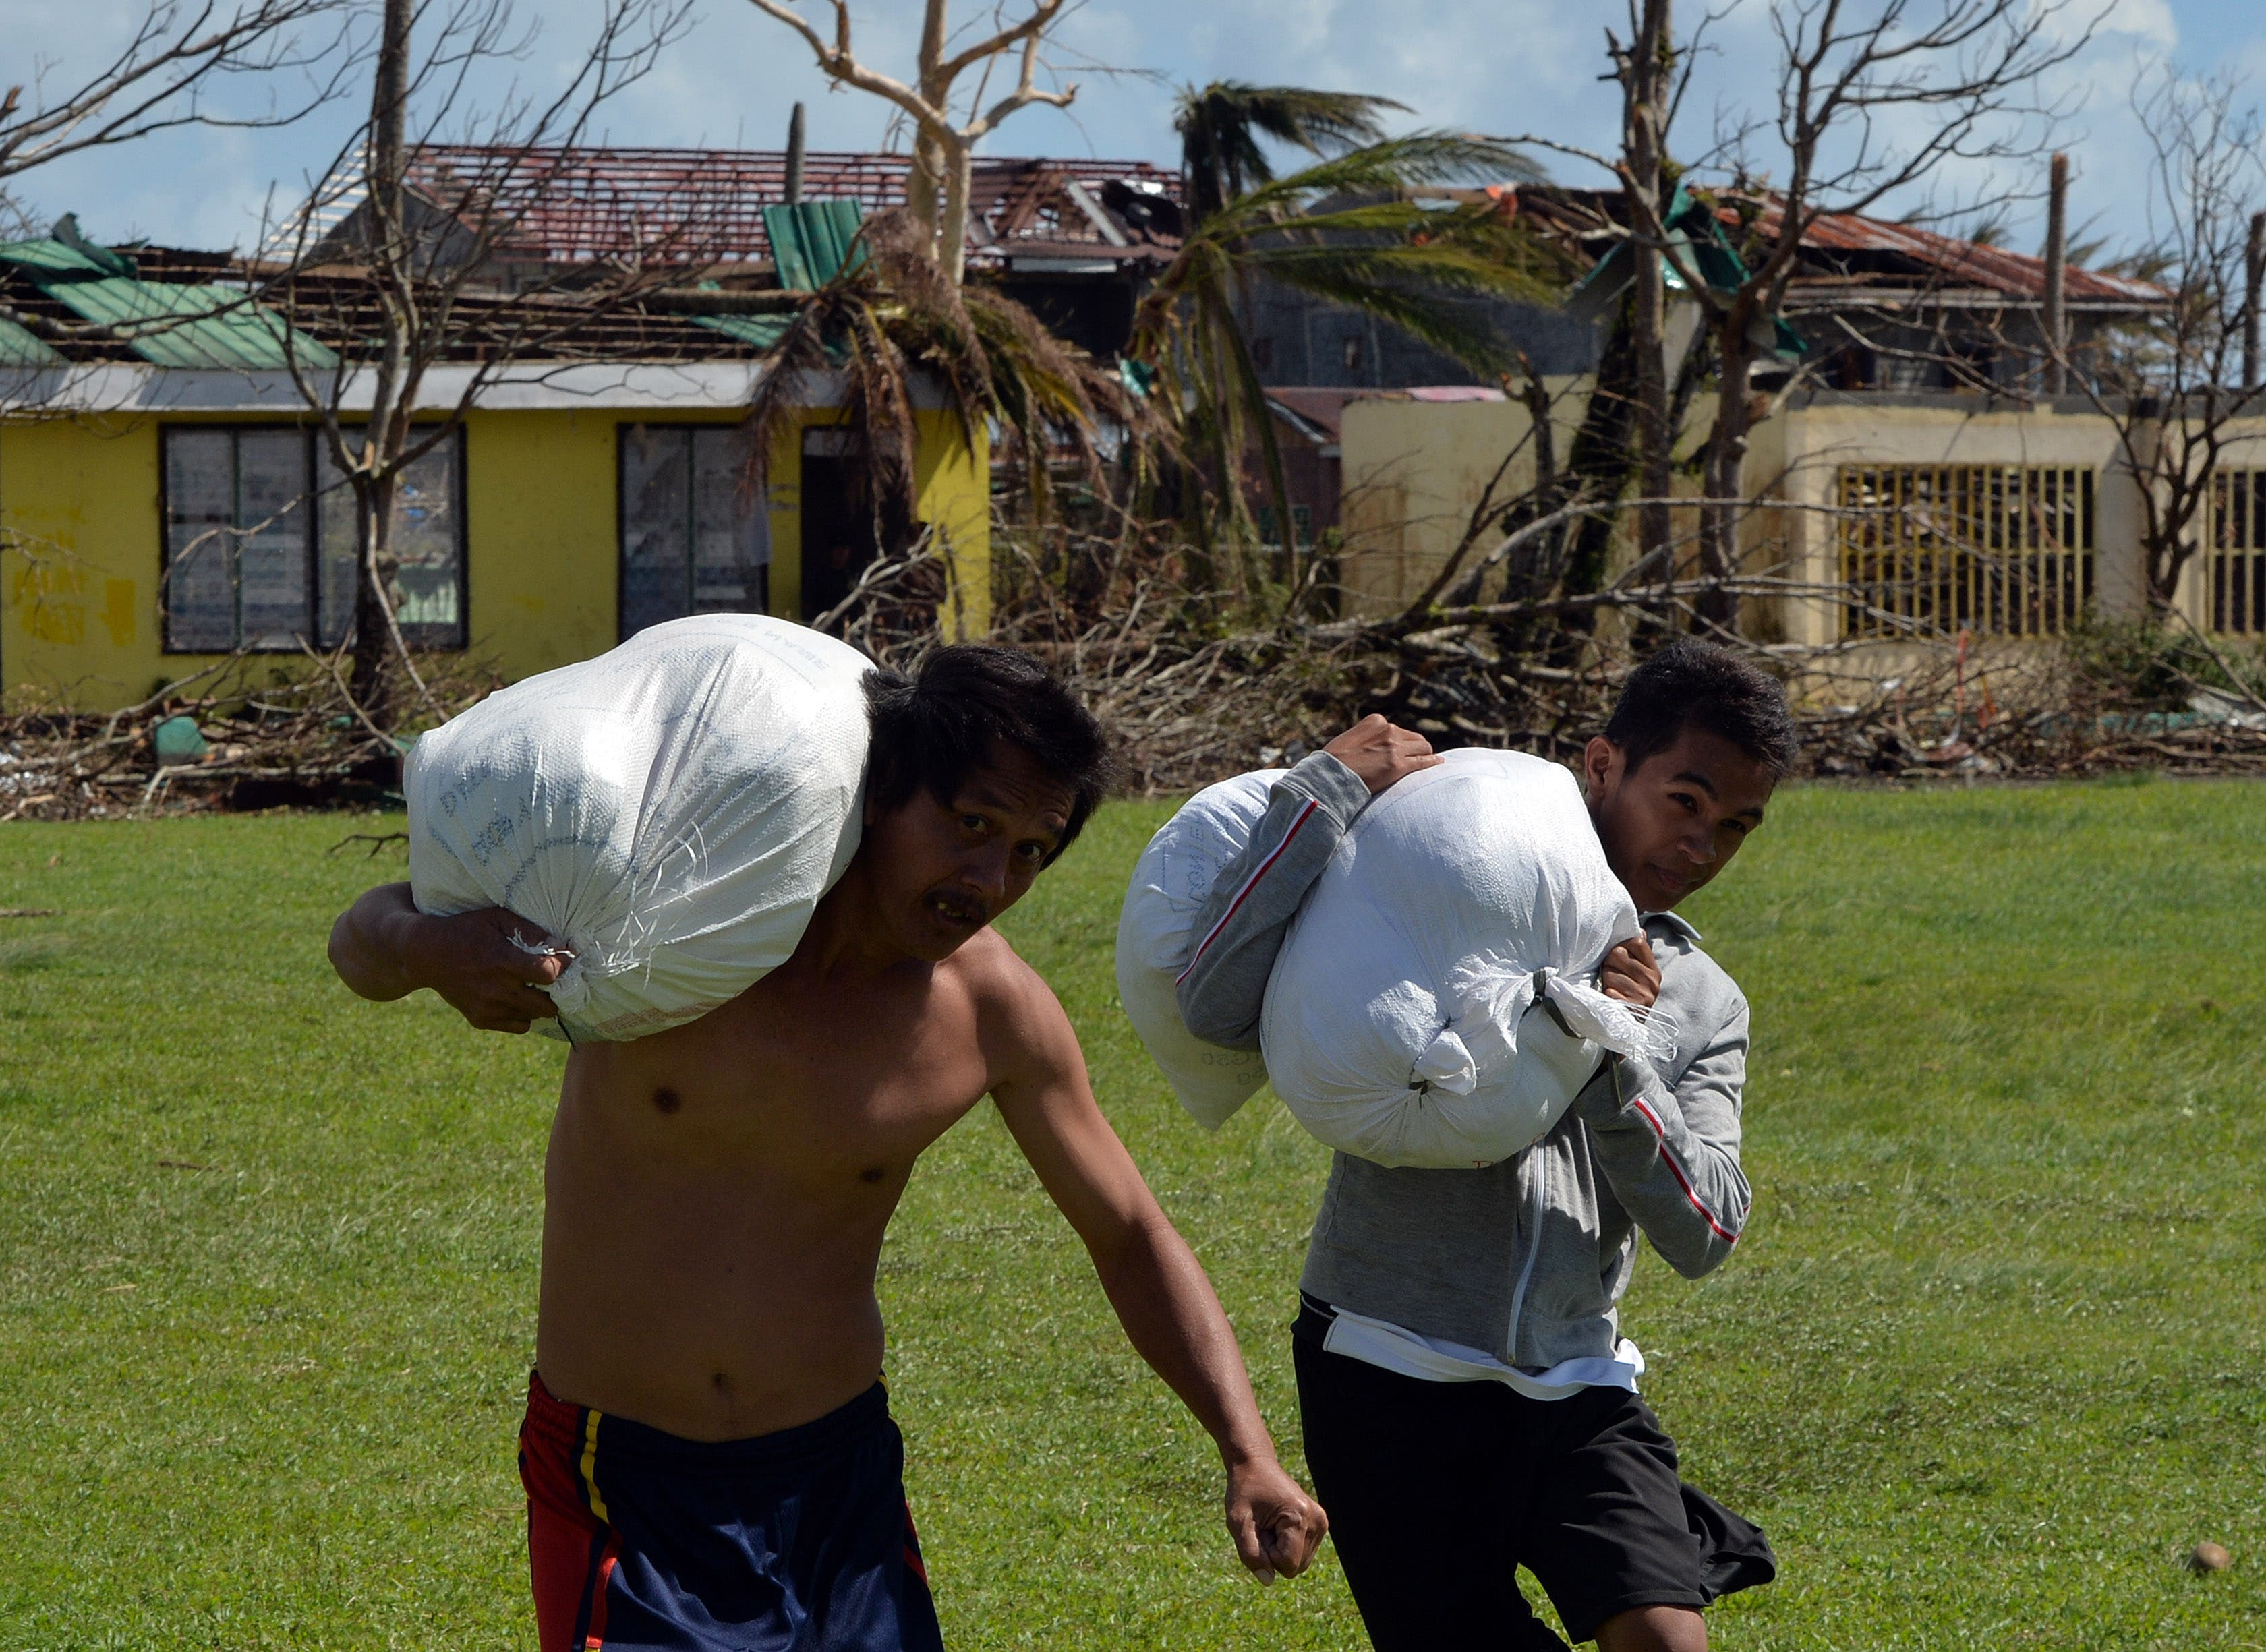 Villagers unload U.S. Aid from a U.S. Marines Osprey aircraft at Balangiga City, Samar Province on Nov. 16, 2013. (AFP)